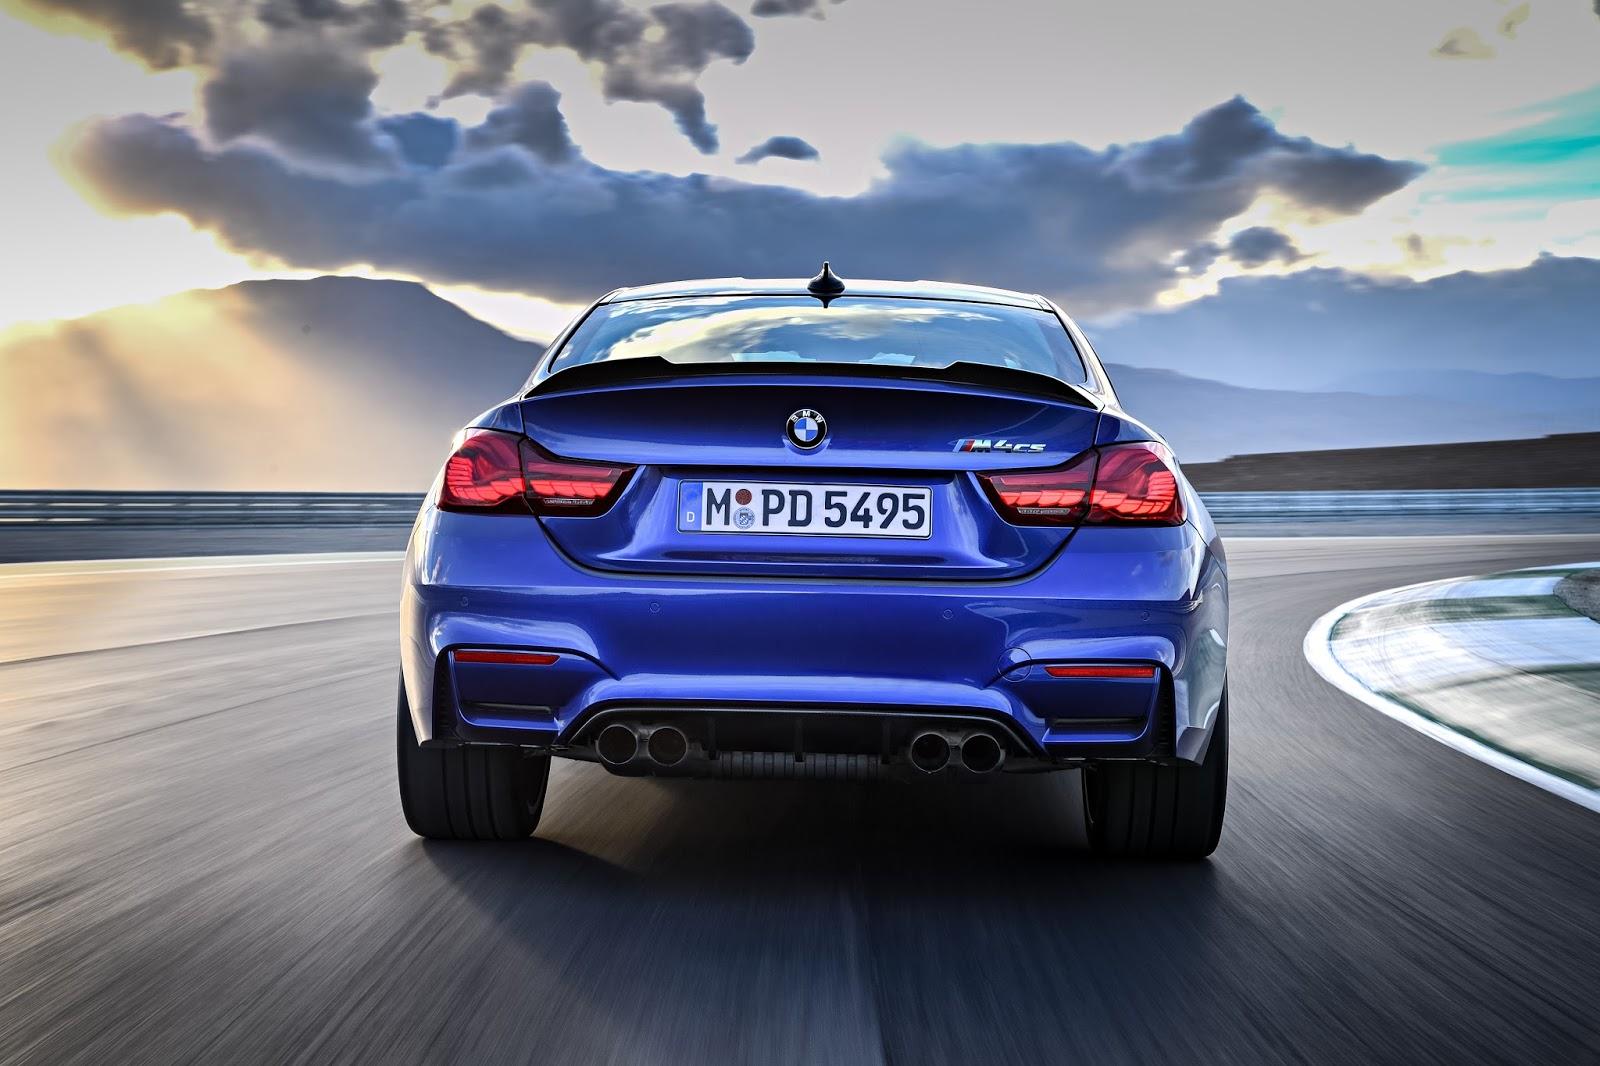 P90251039 highRes the new bmw m4 cs 04 Η περιορισμένης παραγωγής BMW M4 ClubSport δική σας με 116.900 ευρώ BMW, BMW M, BMW M4, BMW M4 CS, BMW Motorsport, clubsport, COUPE, Limited edition, supercars, supersport, videos, Περιορισμένης παραγωγής